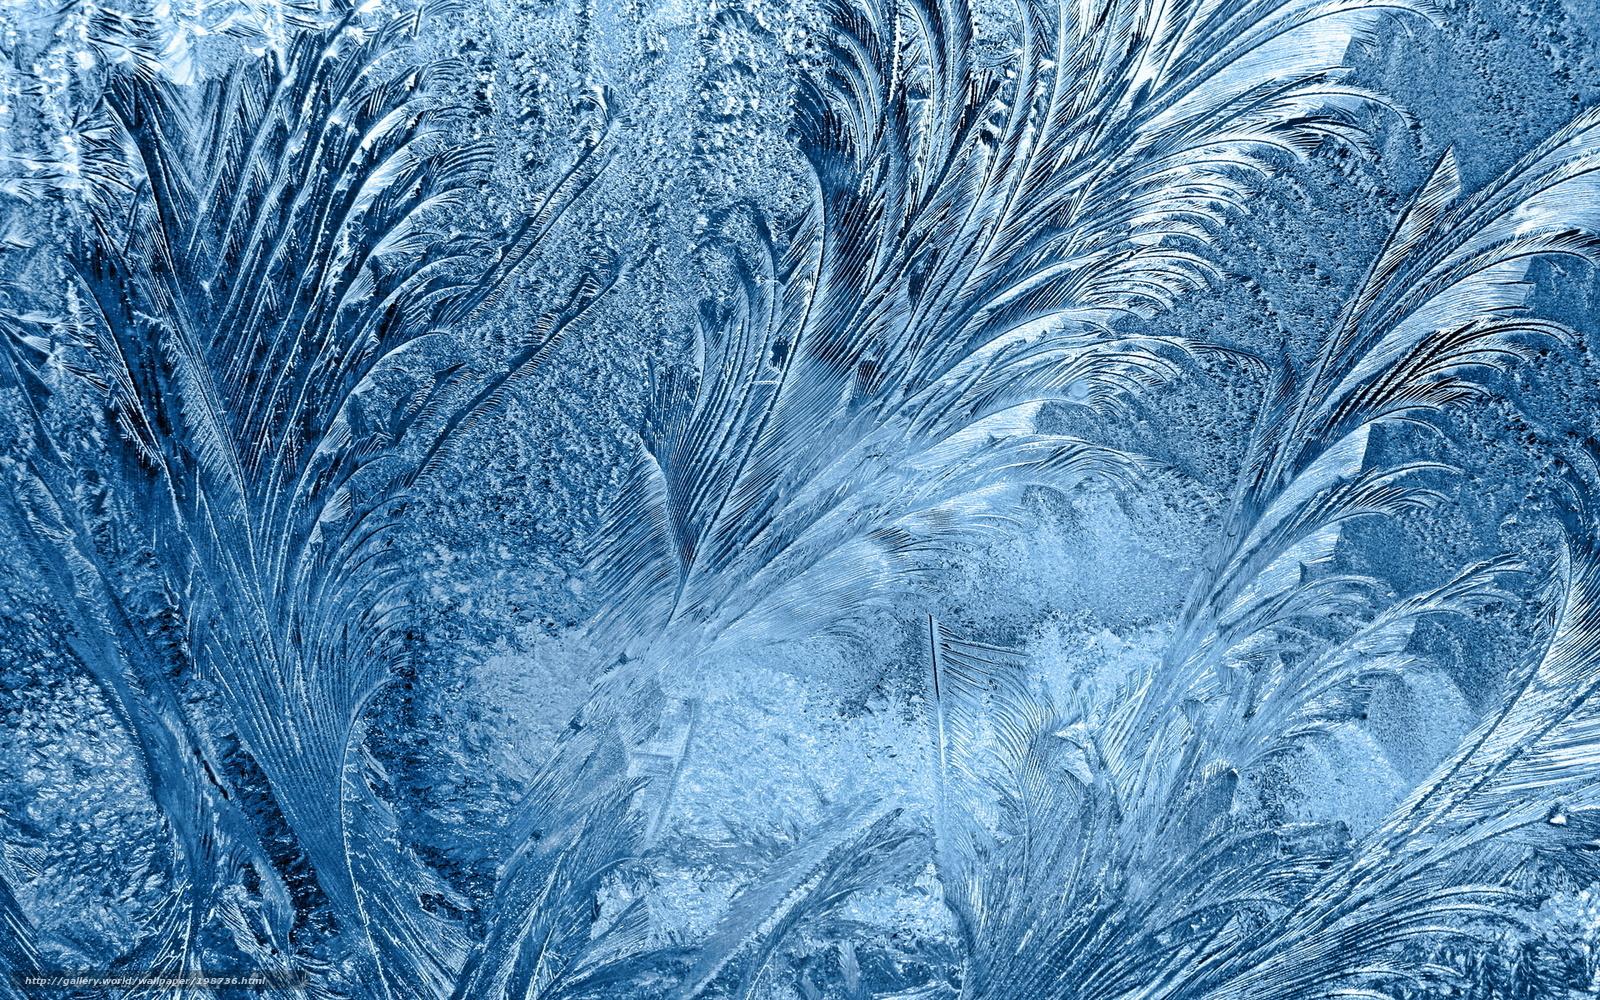 Мультфильмы дед мороз и снегурка